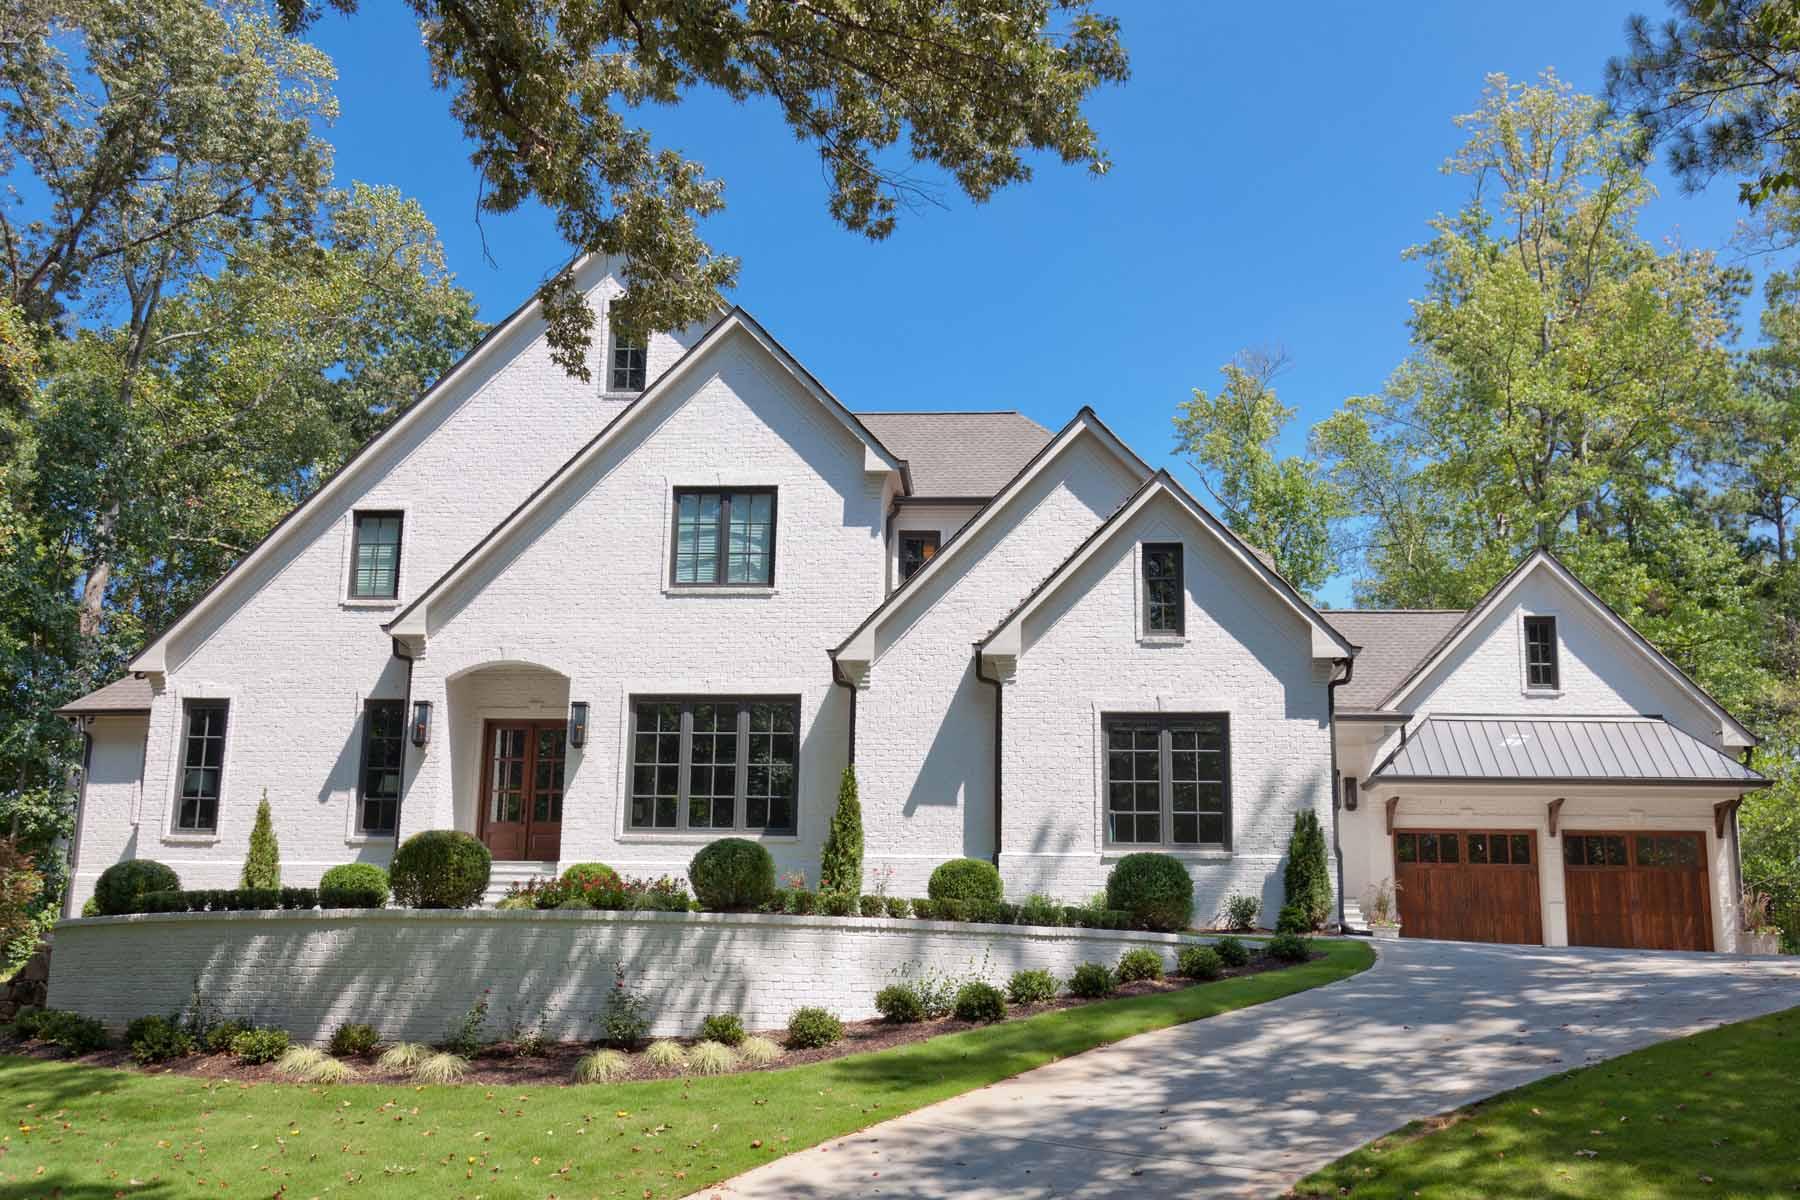 Single Family Home for Sale at New Custom Build in Sandy Springs 6605 Cherry Tree Lane Atlanta, Georgia 30328 United States